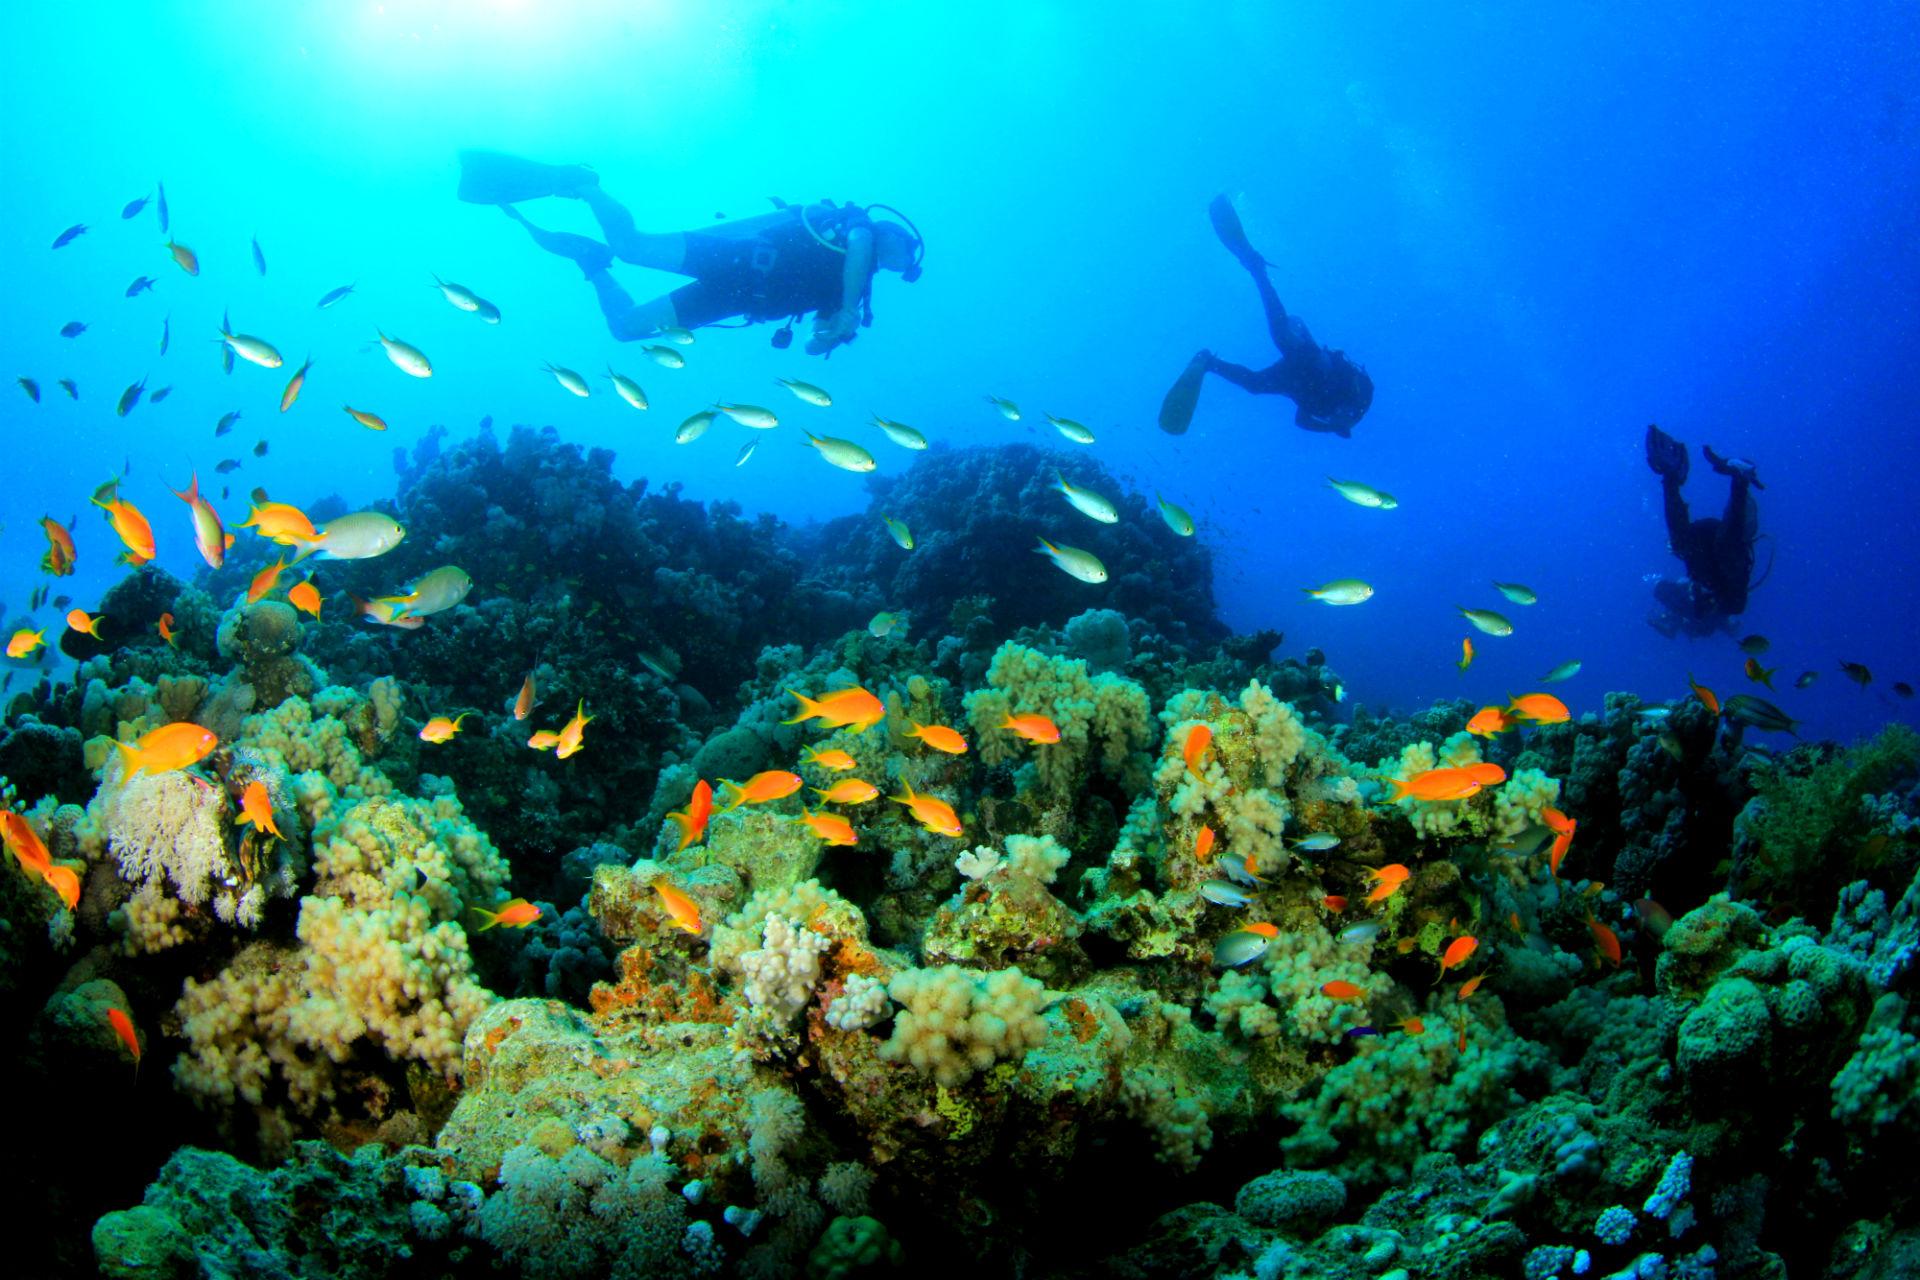 scuba diving wallpaper wallpapers - photo #16